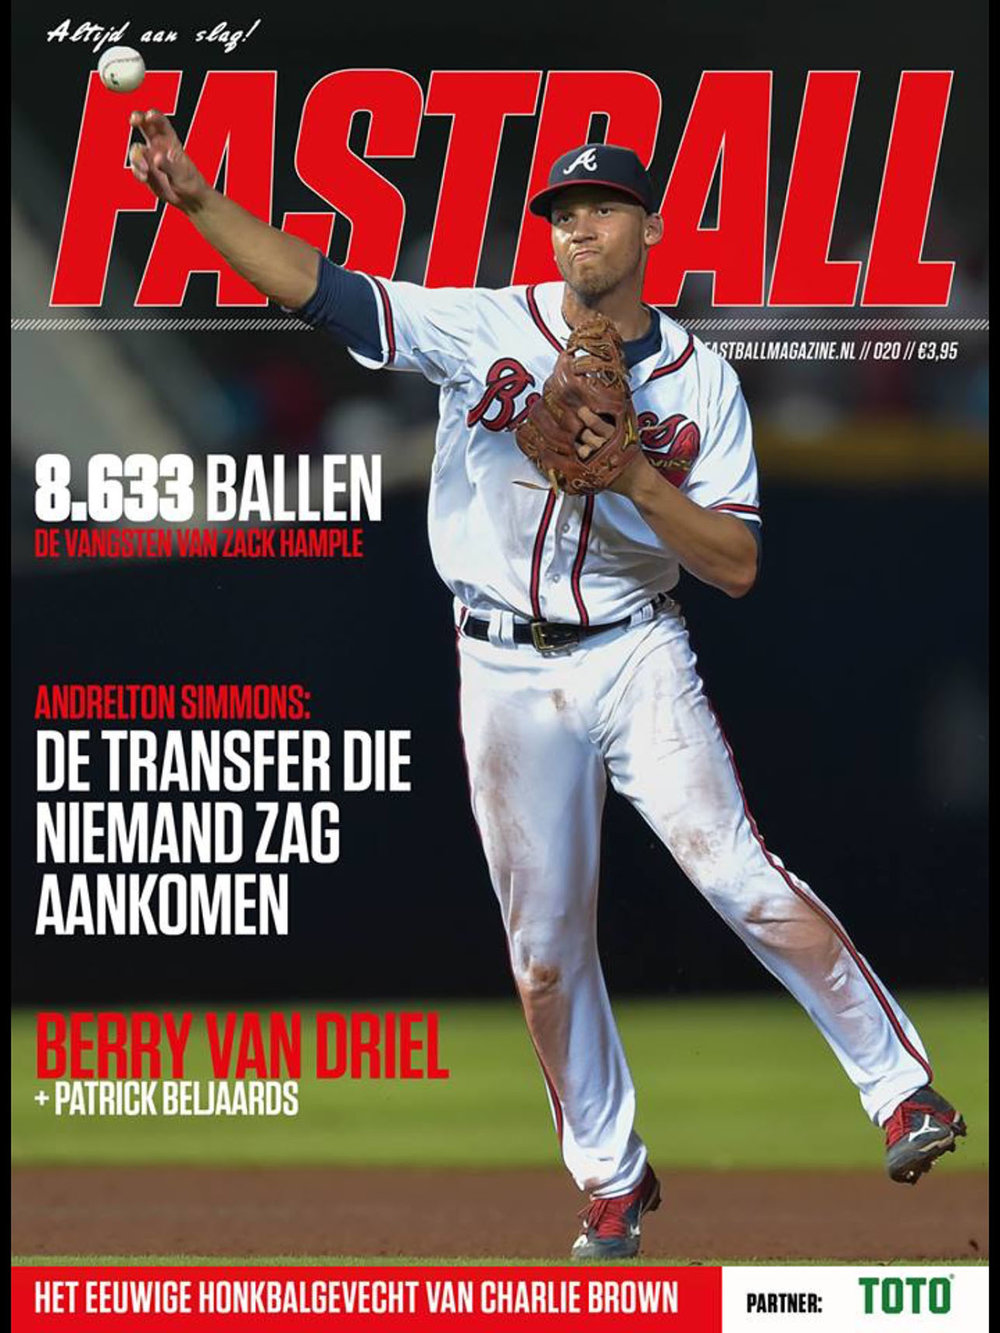 fastball1b.jpg